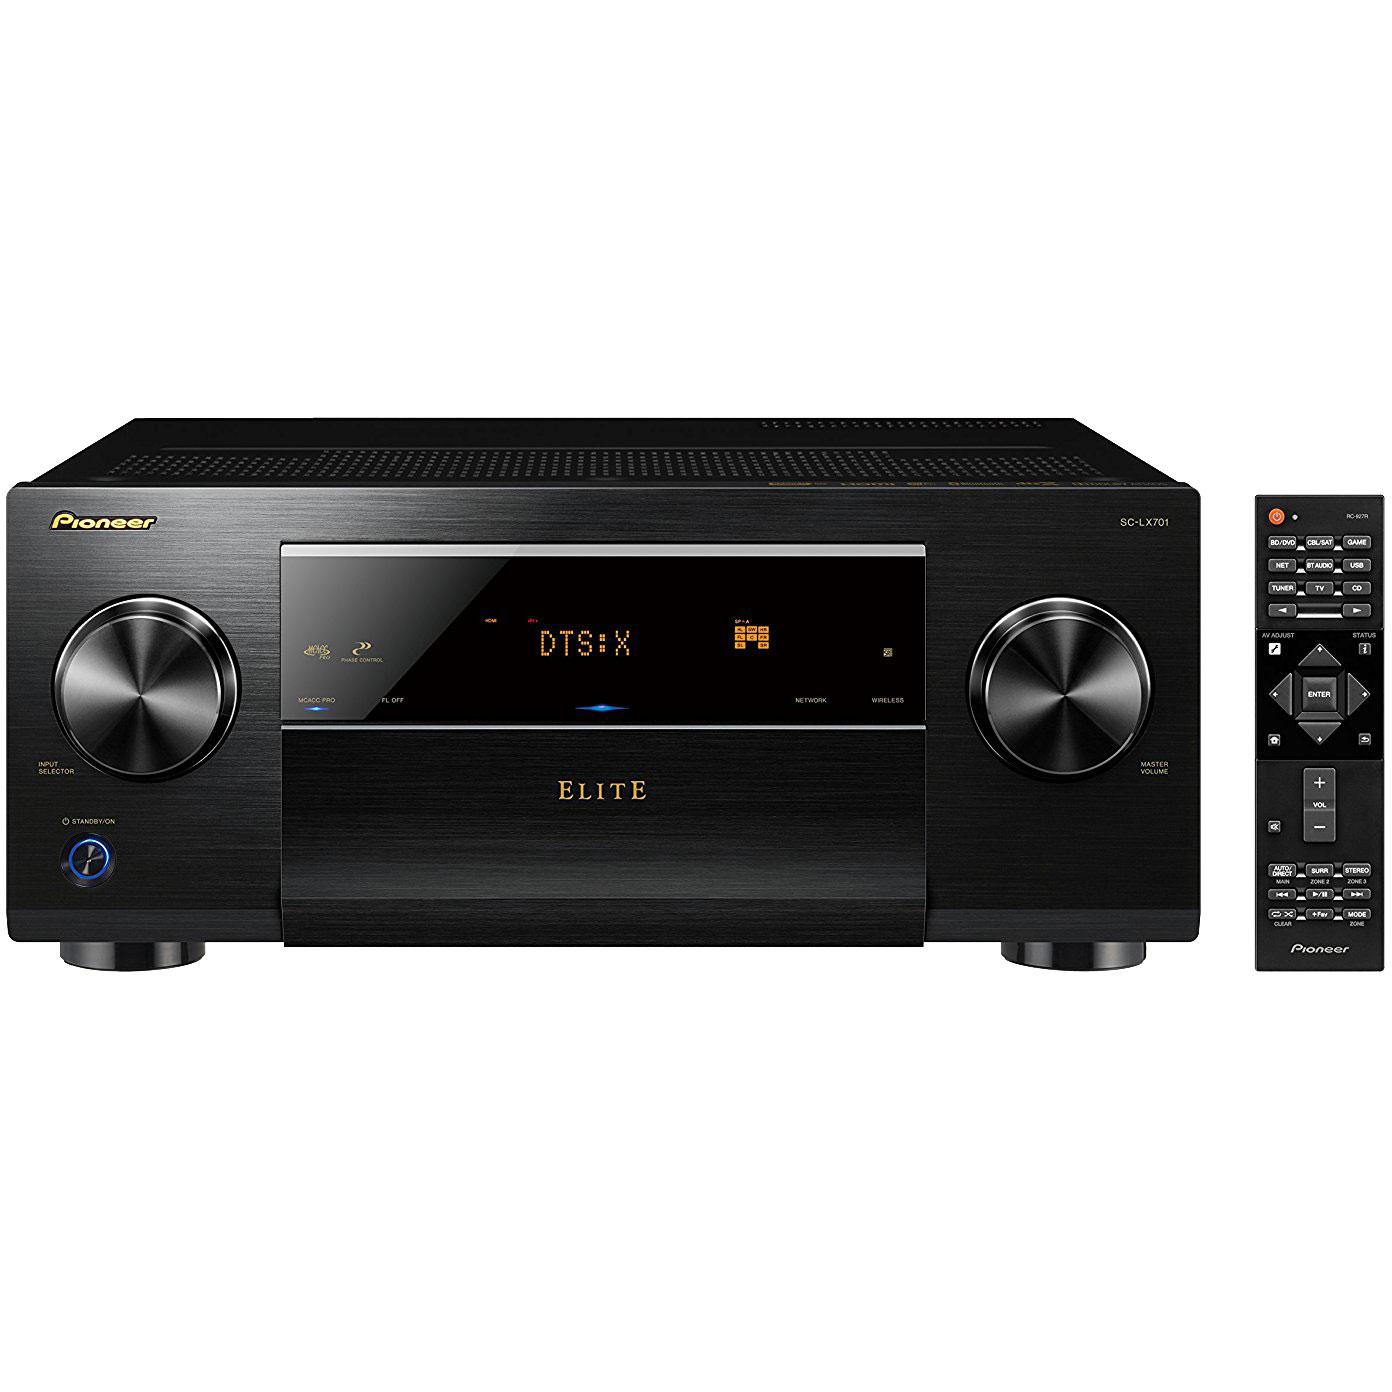 Pioneer SC-LX701 9.2ch Network AV Receiver Audio&Video Component Receiver Black by Pioneer